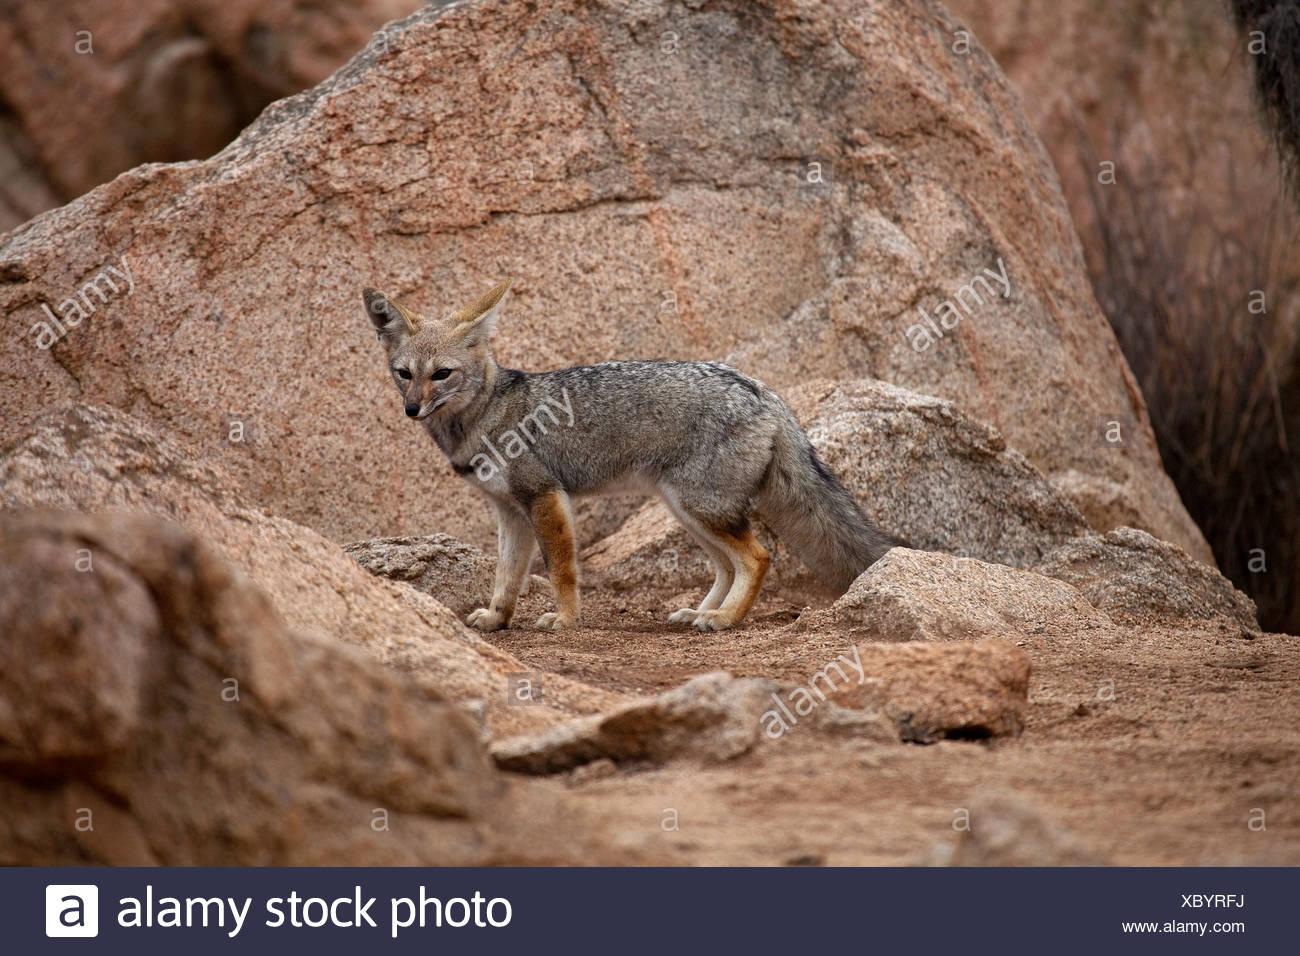 Chile, Parque Nacional Pan de Azucar, fox - Stock Image